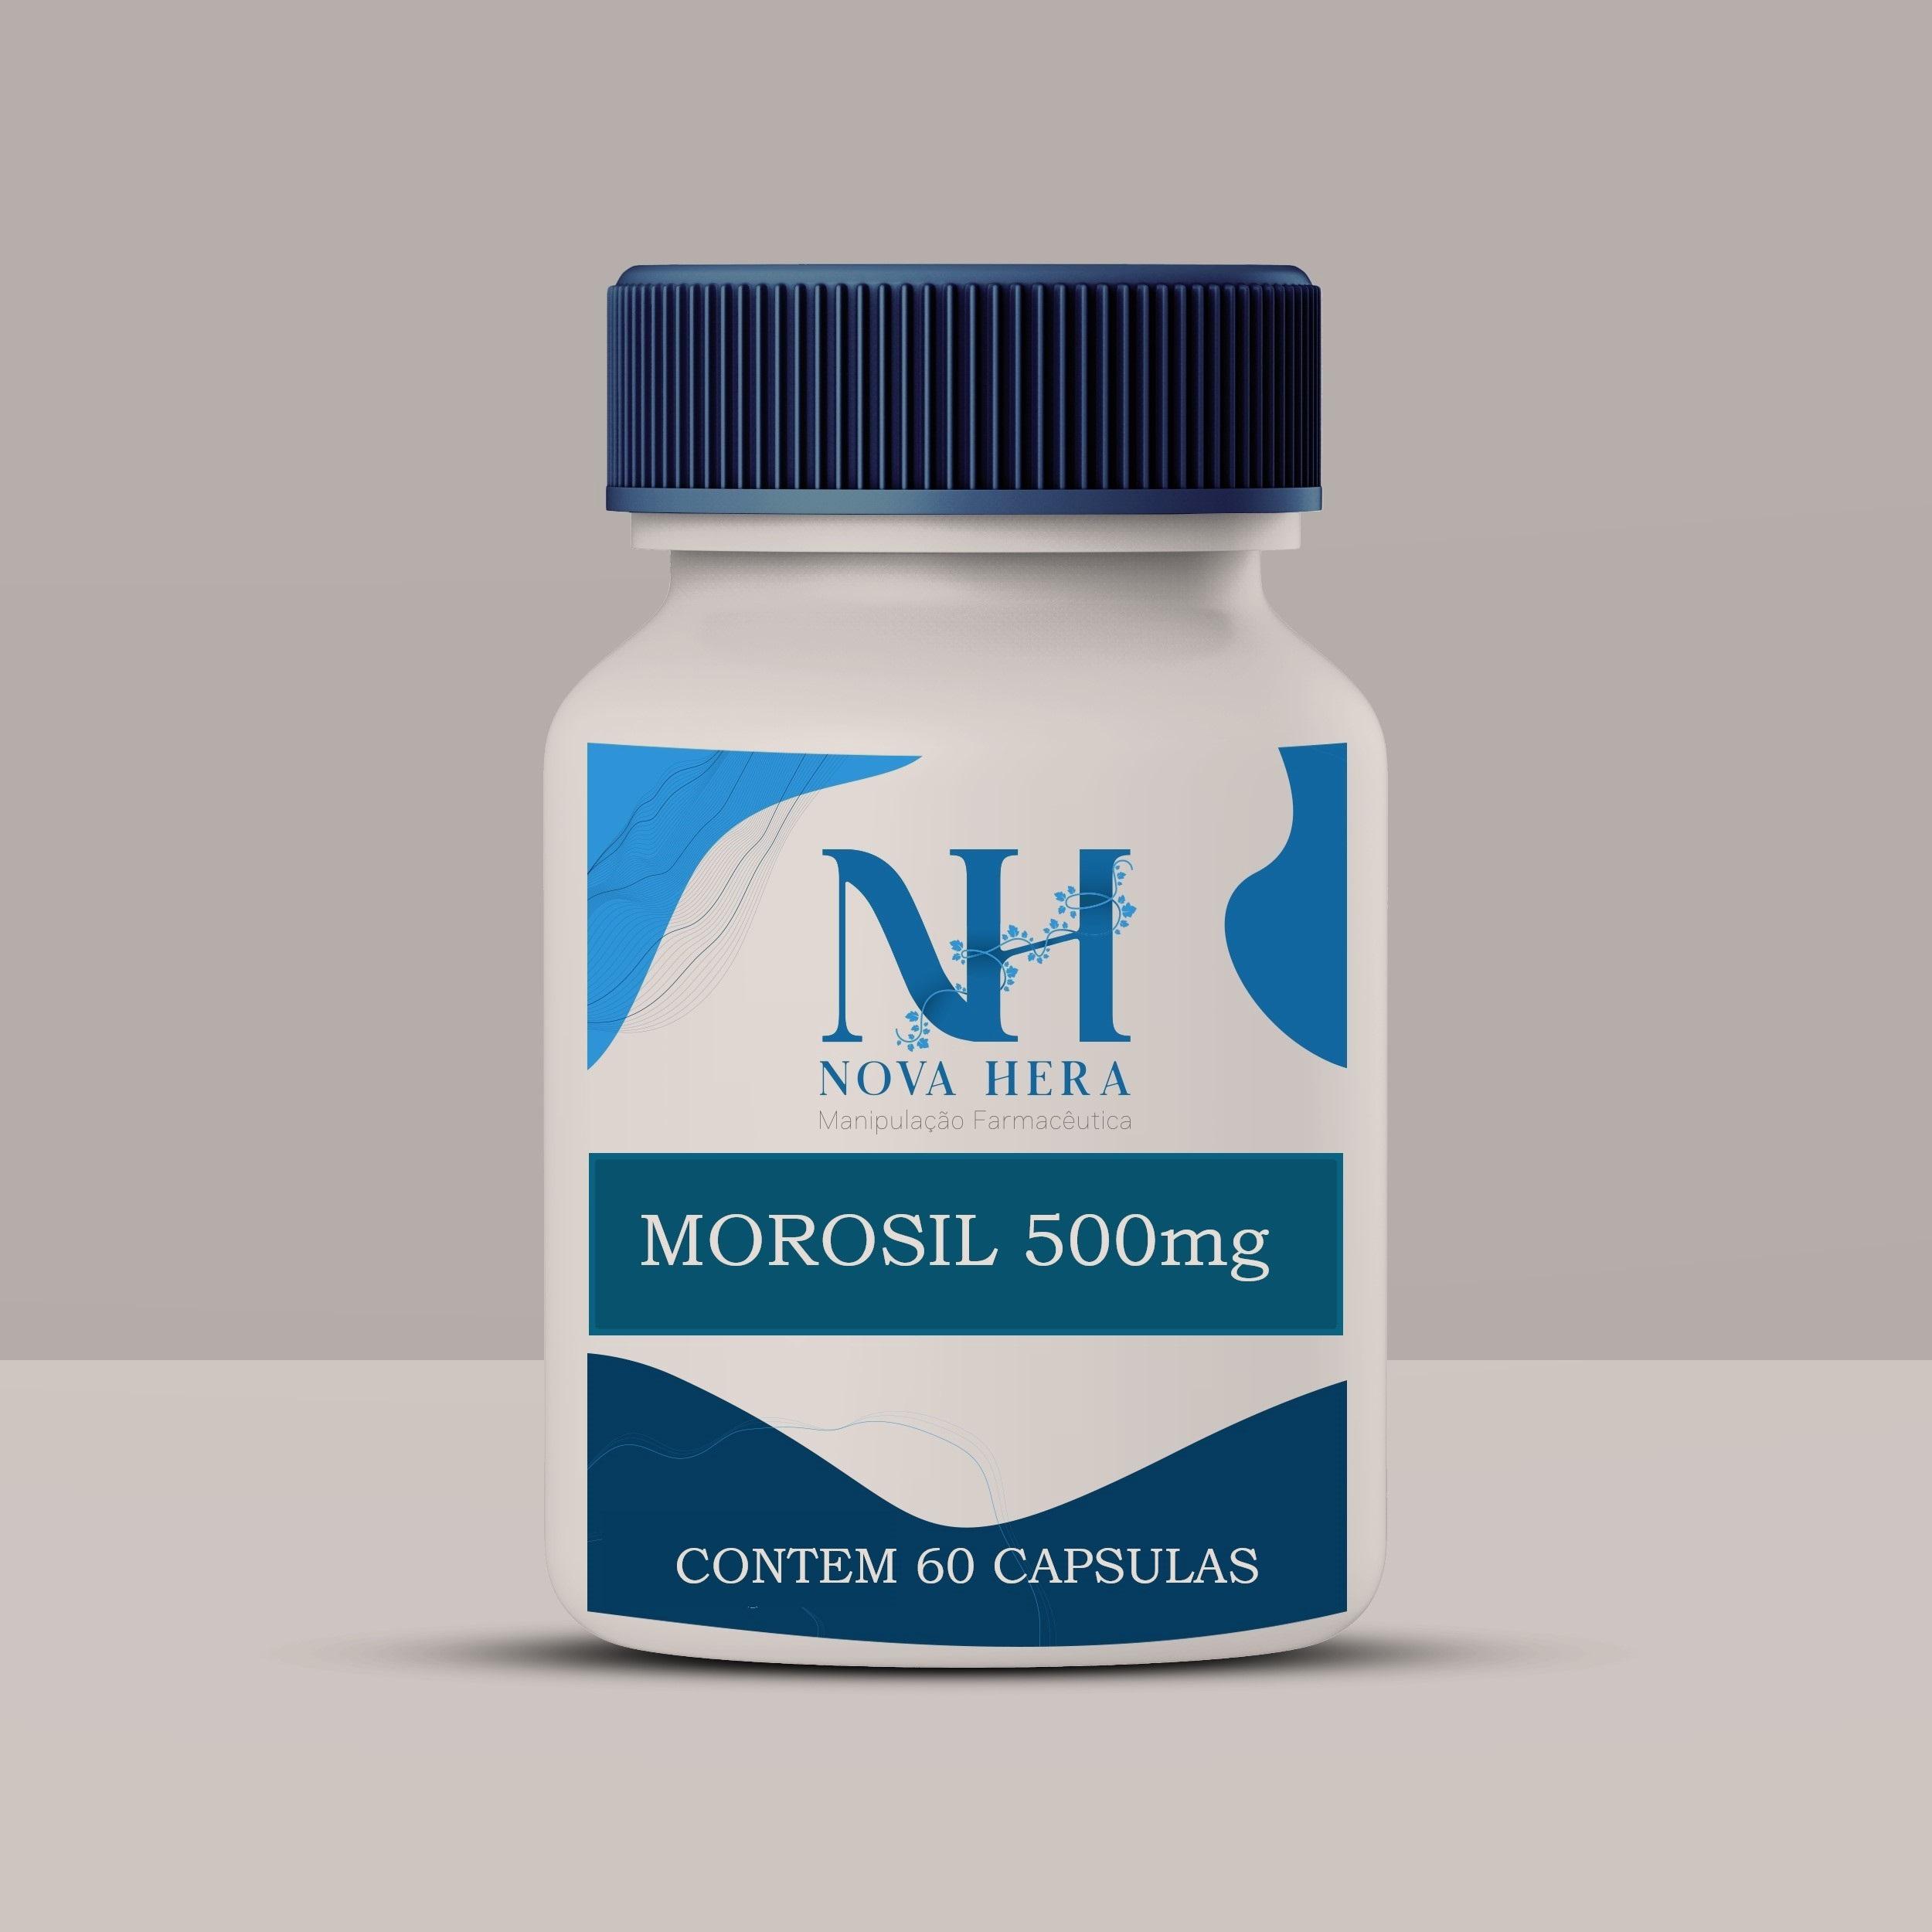 https://www.farmacianovahera.com.br/view/_upload/produto/44/1595015556morosil---jpeg.jpg